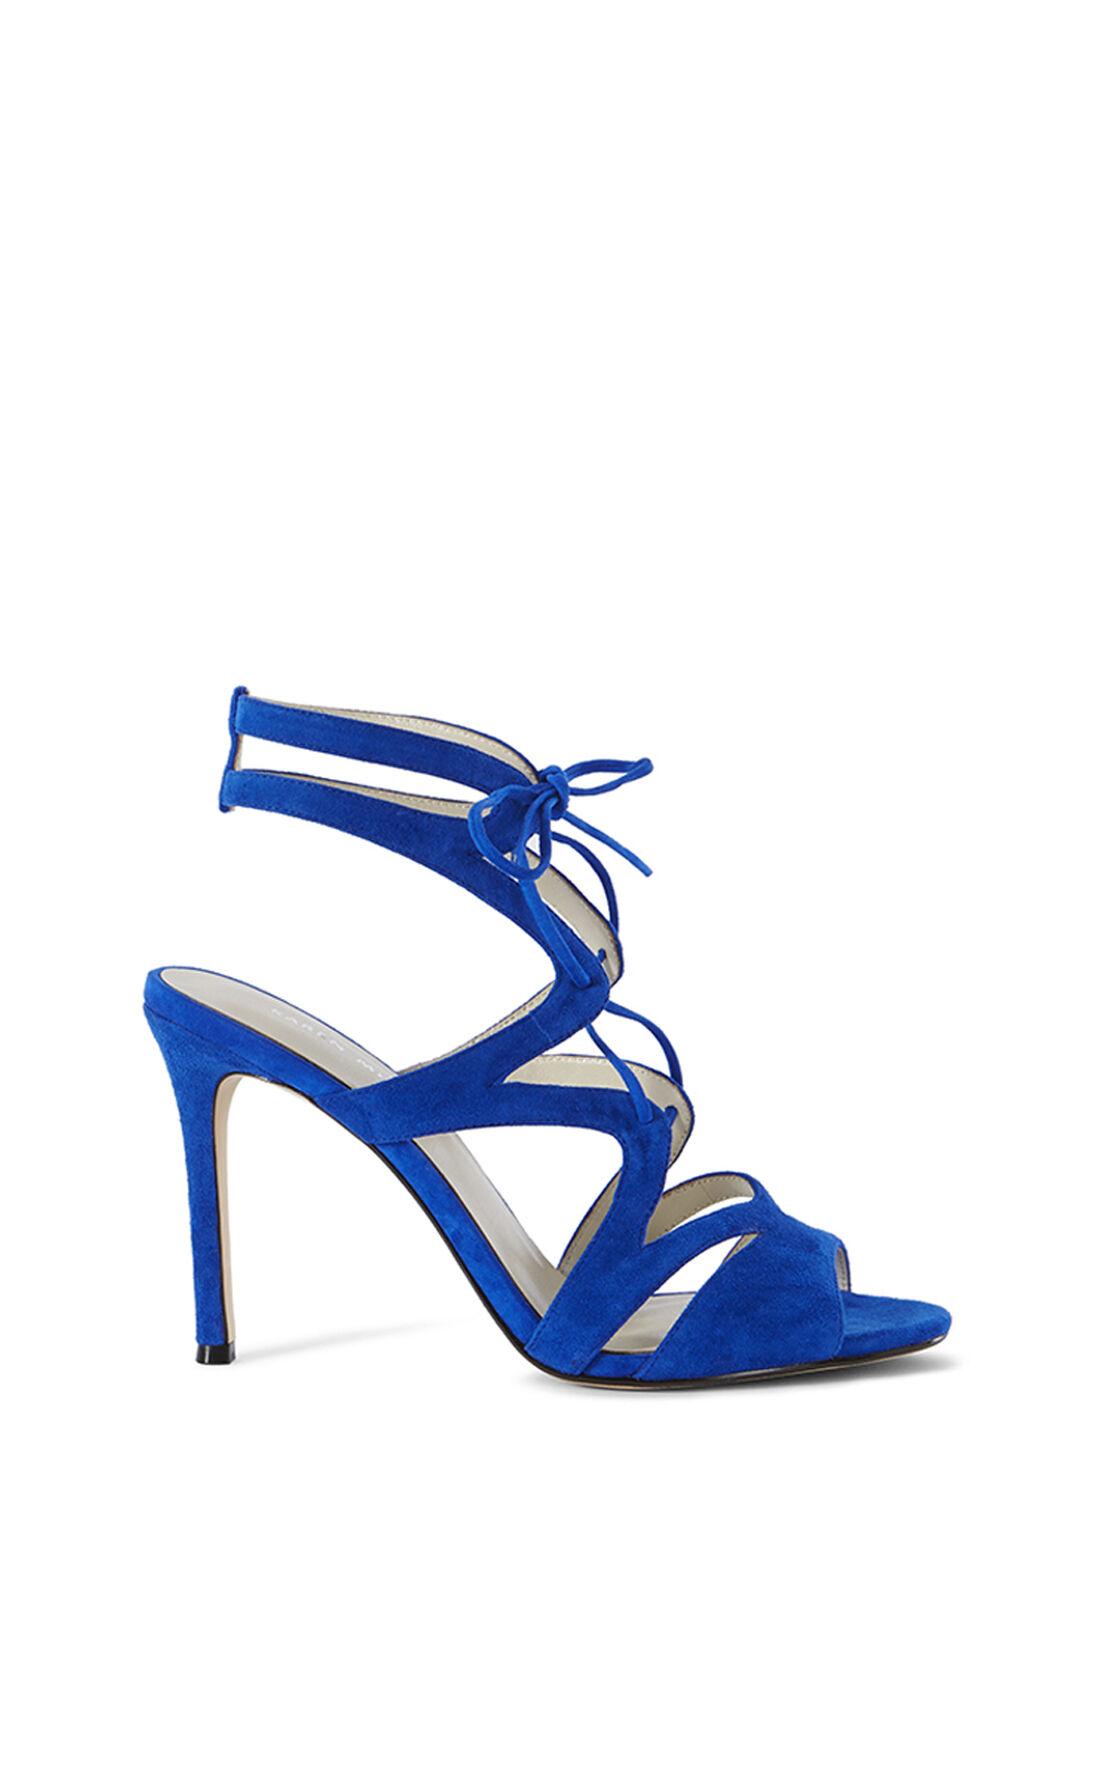 Karen Millen, SUEDE LACE-UP SANDAL Blue 0